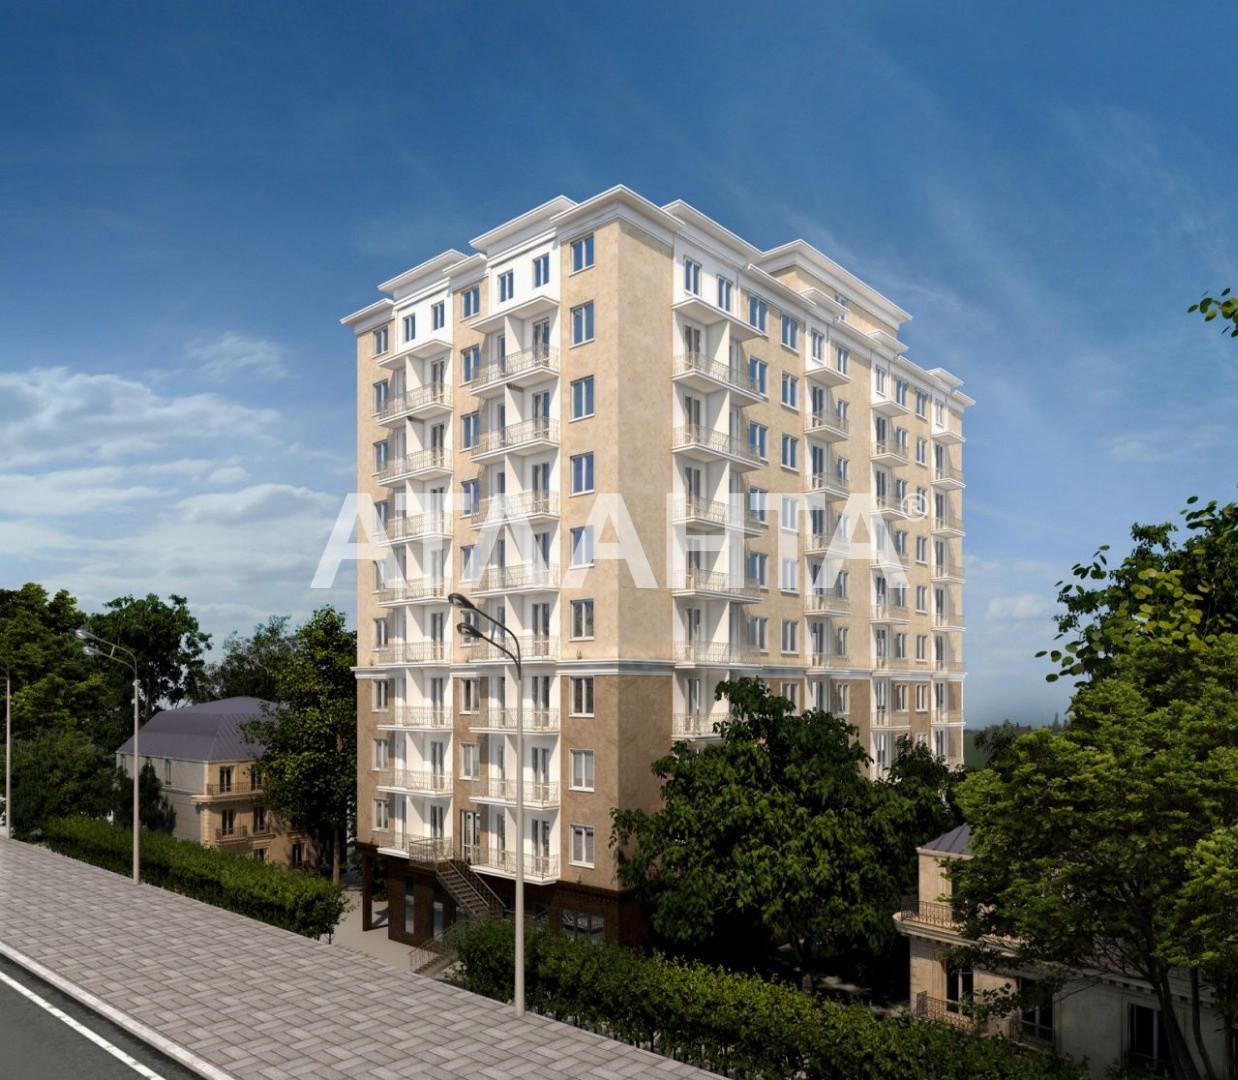 Продается 1-комнатная Квартира на ул. Балковская (Фрунзе) — 18 630 у.е. (фото №3)